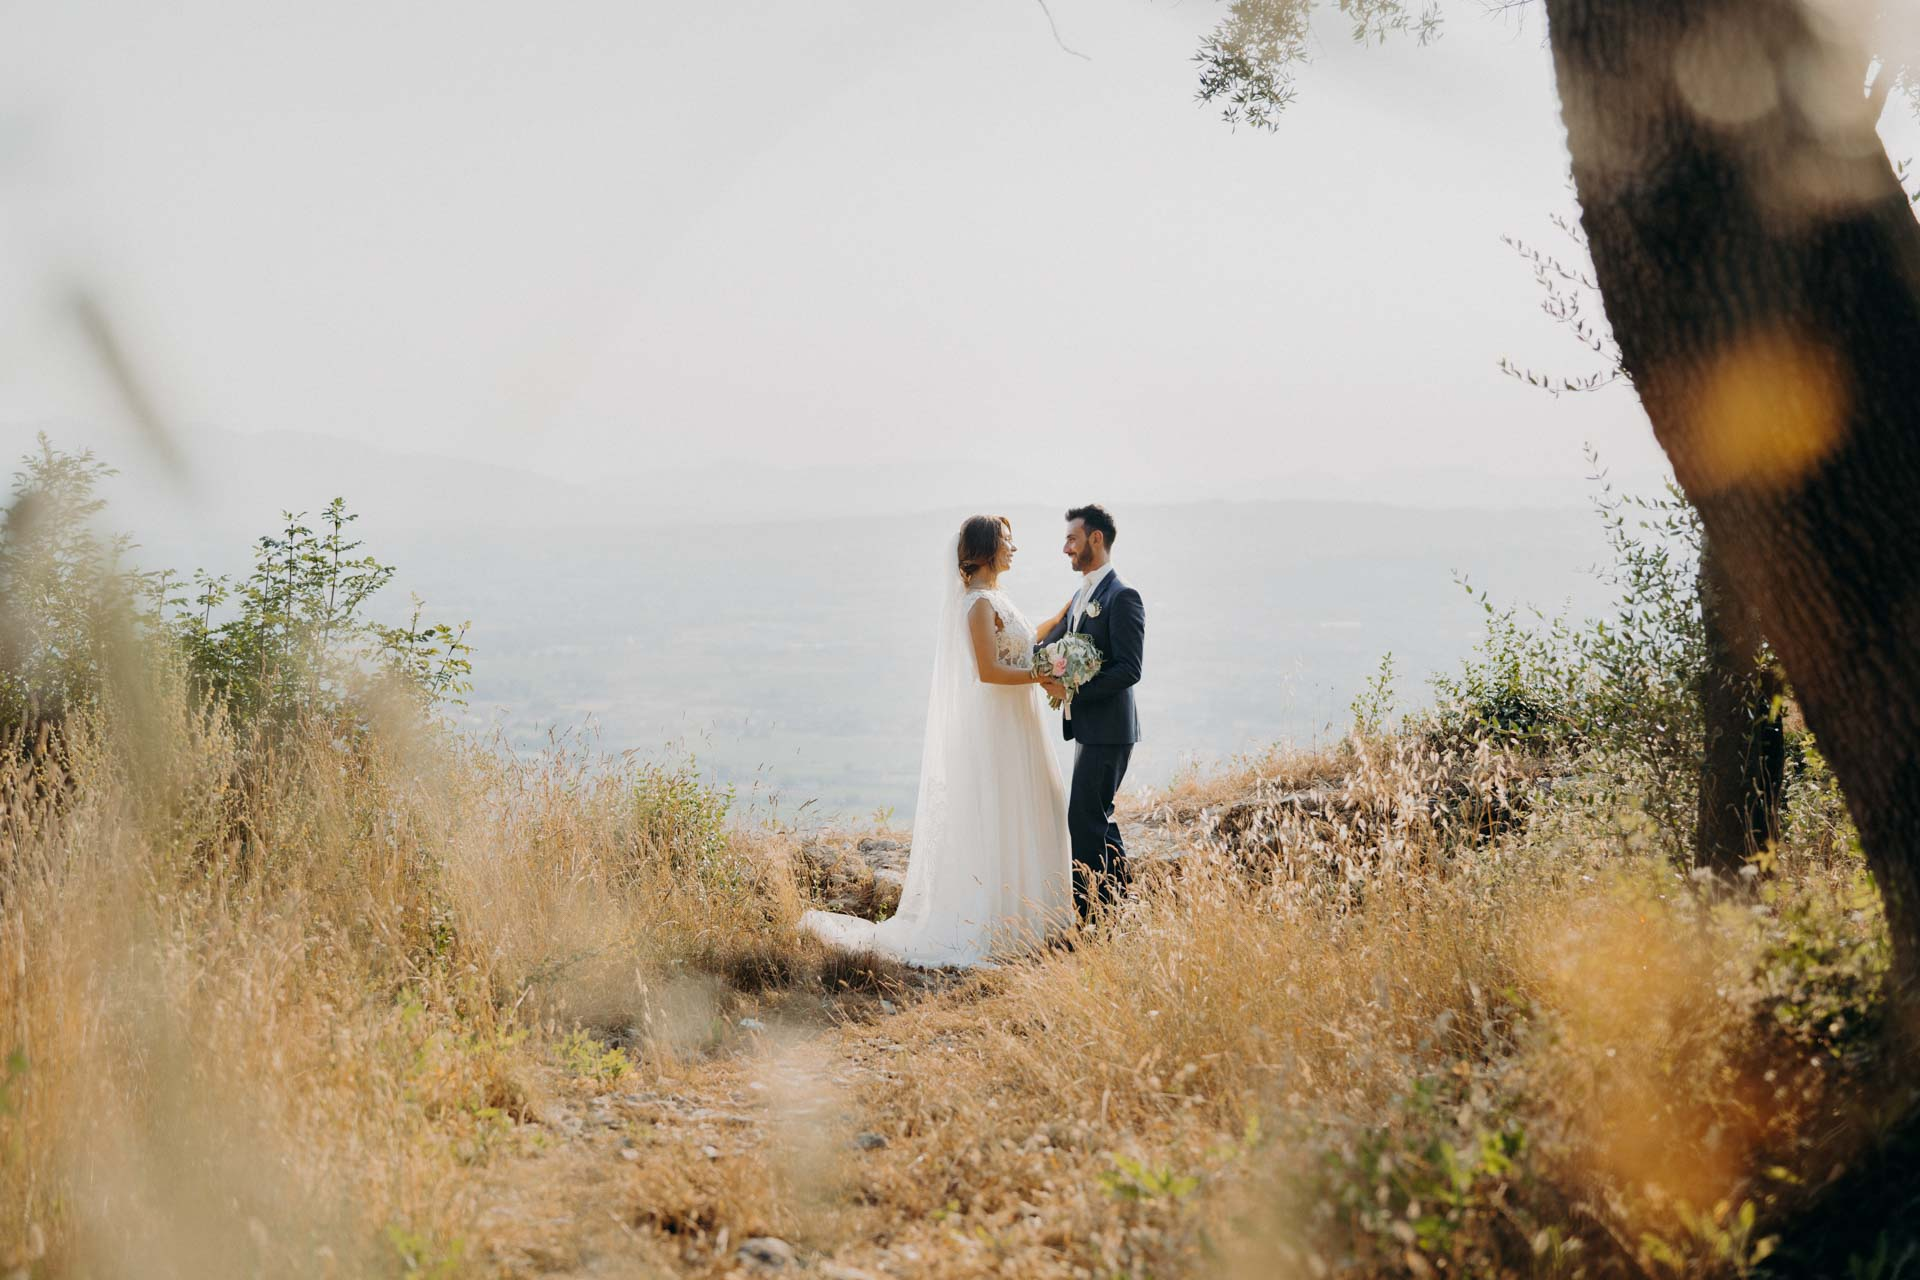 fotografo_matrimonio_toscana_poggio_tondo_70